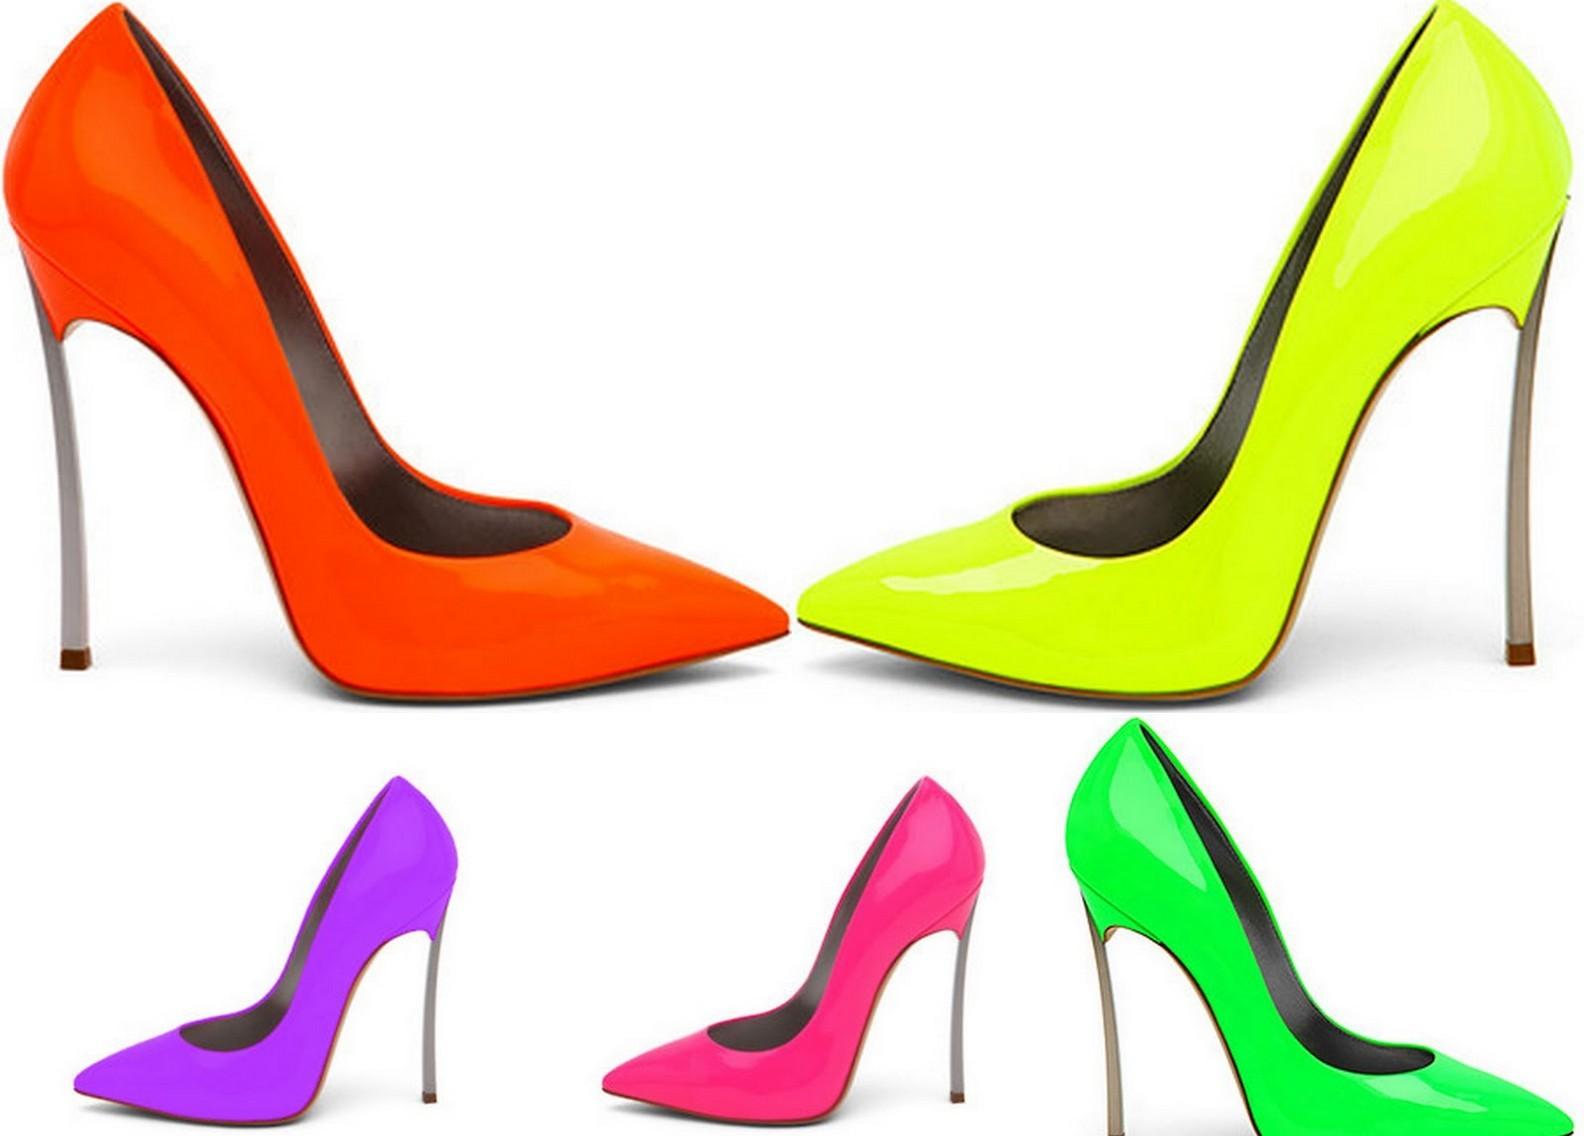 Renkler Neyi İfade Eder?